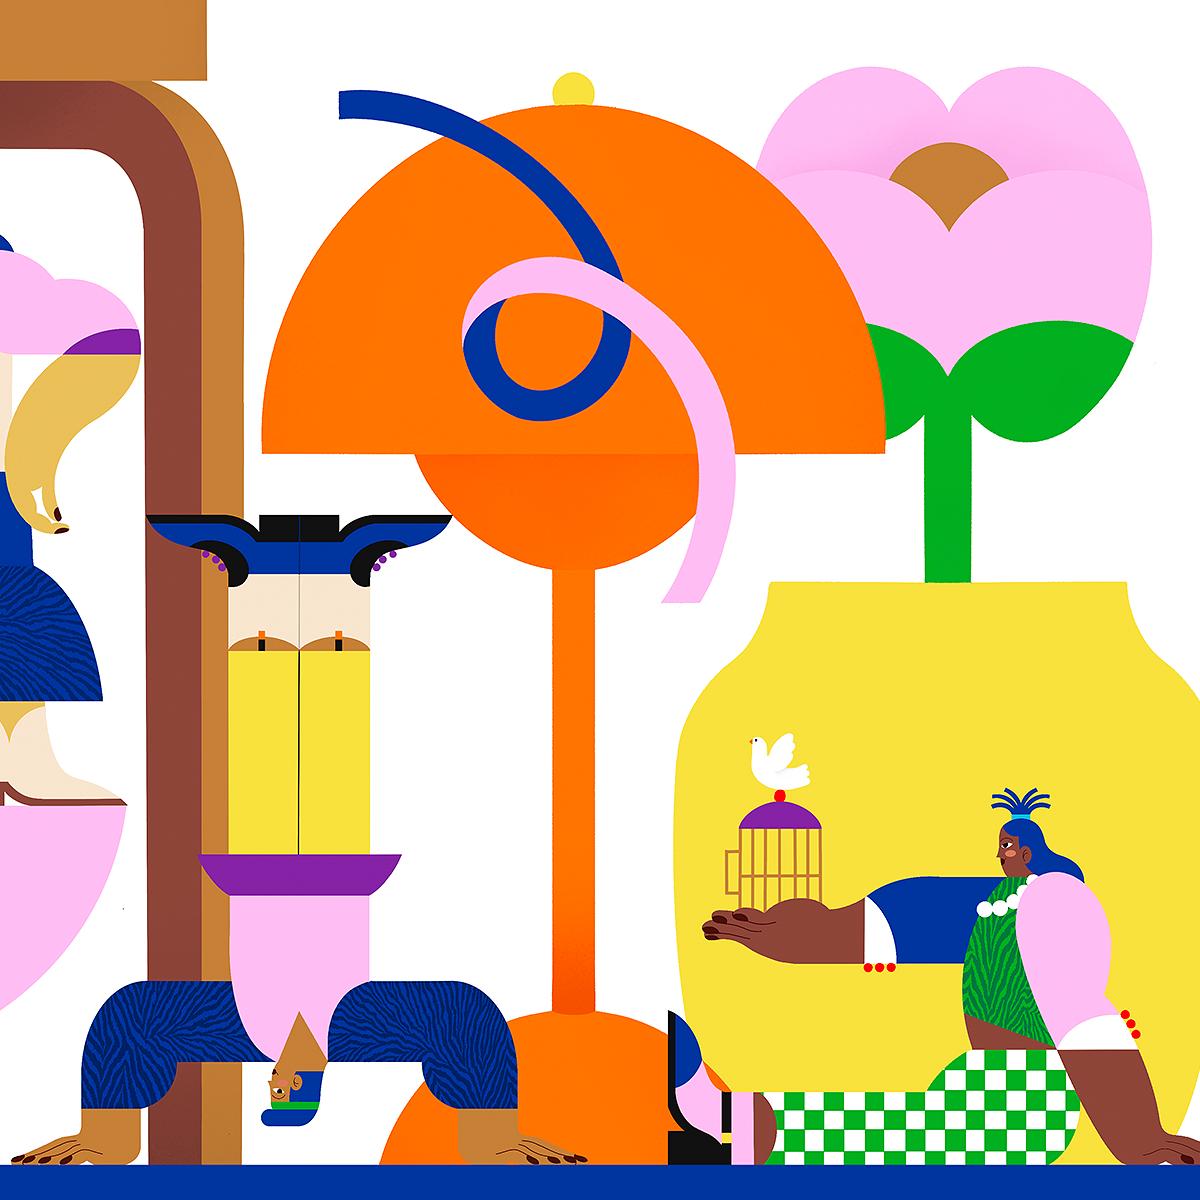 Finnish Design Shop's sustainability efforts